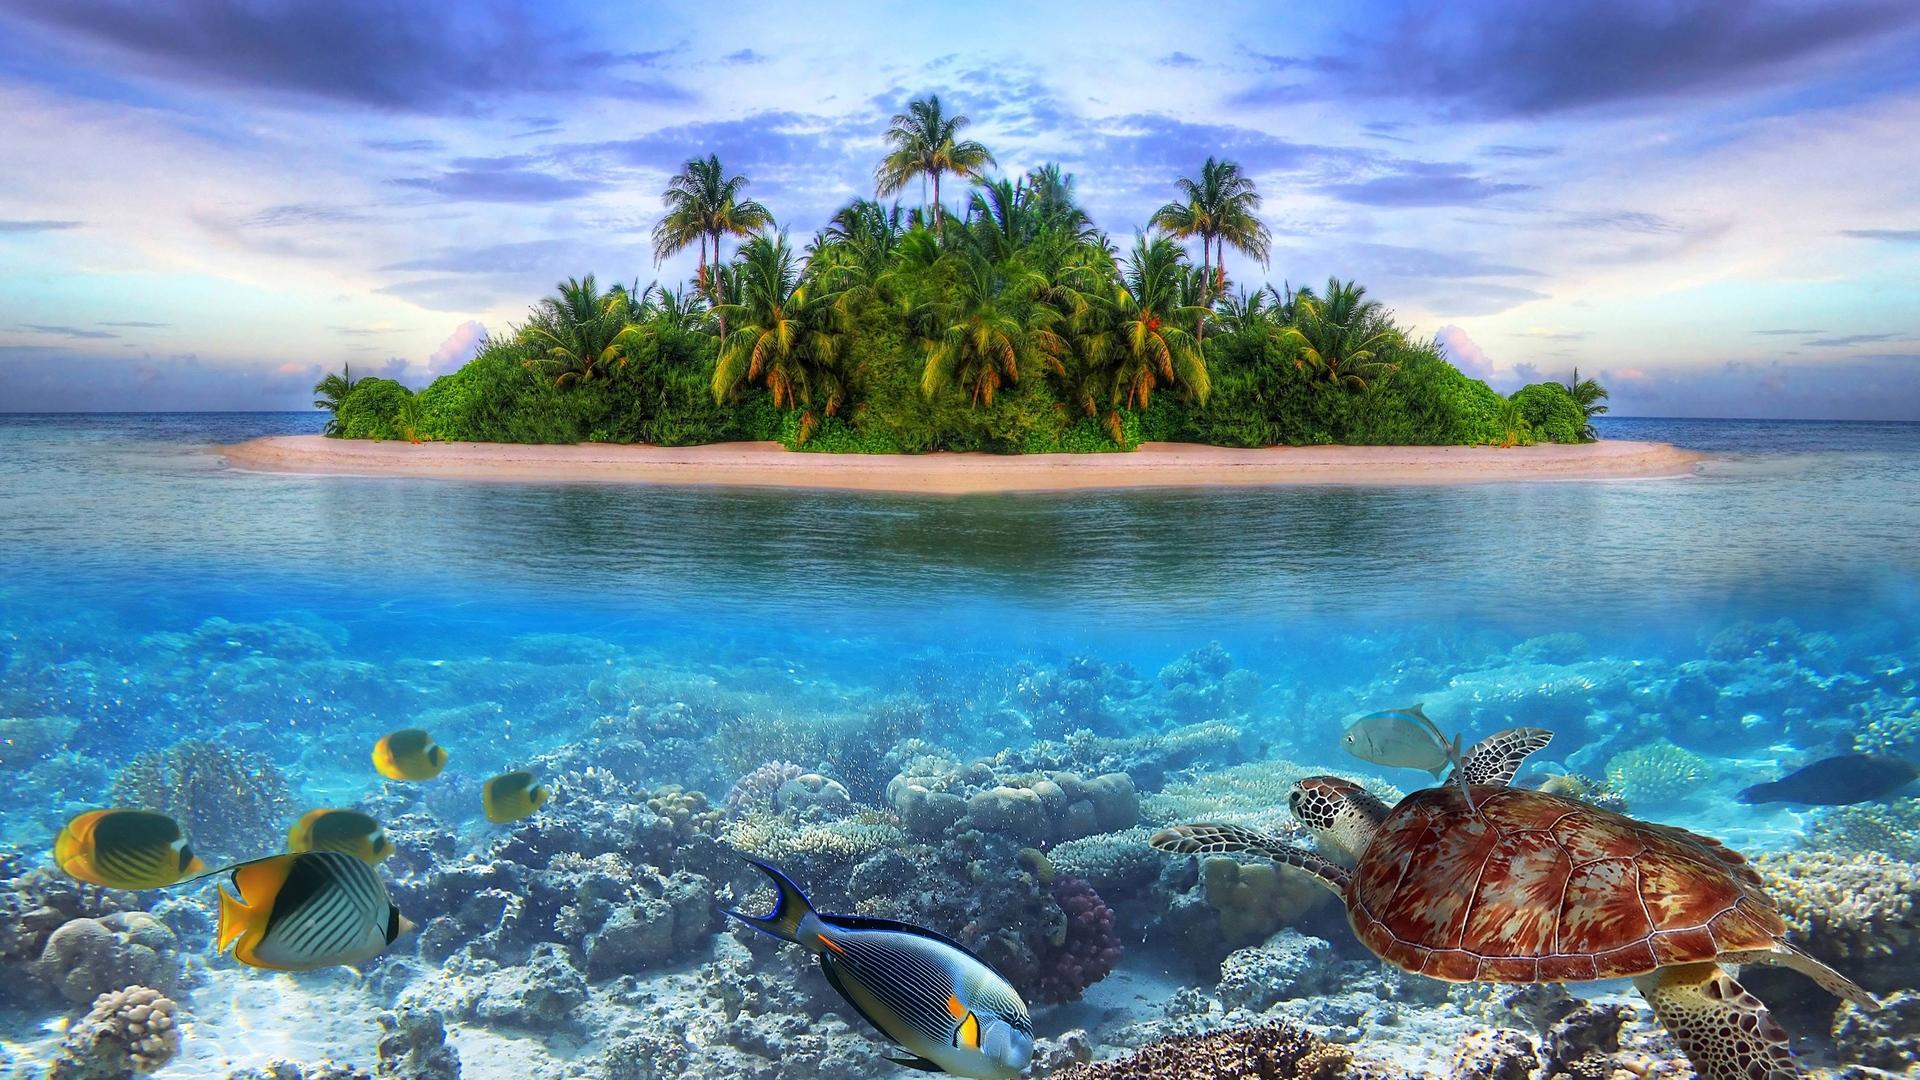 Marine life Tropical island 4K Ultra HD wallpaper 4k WallpaperNet 1920x1080